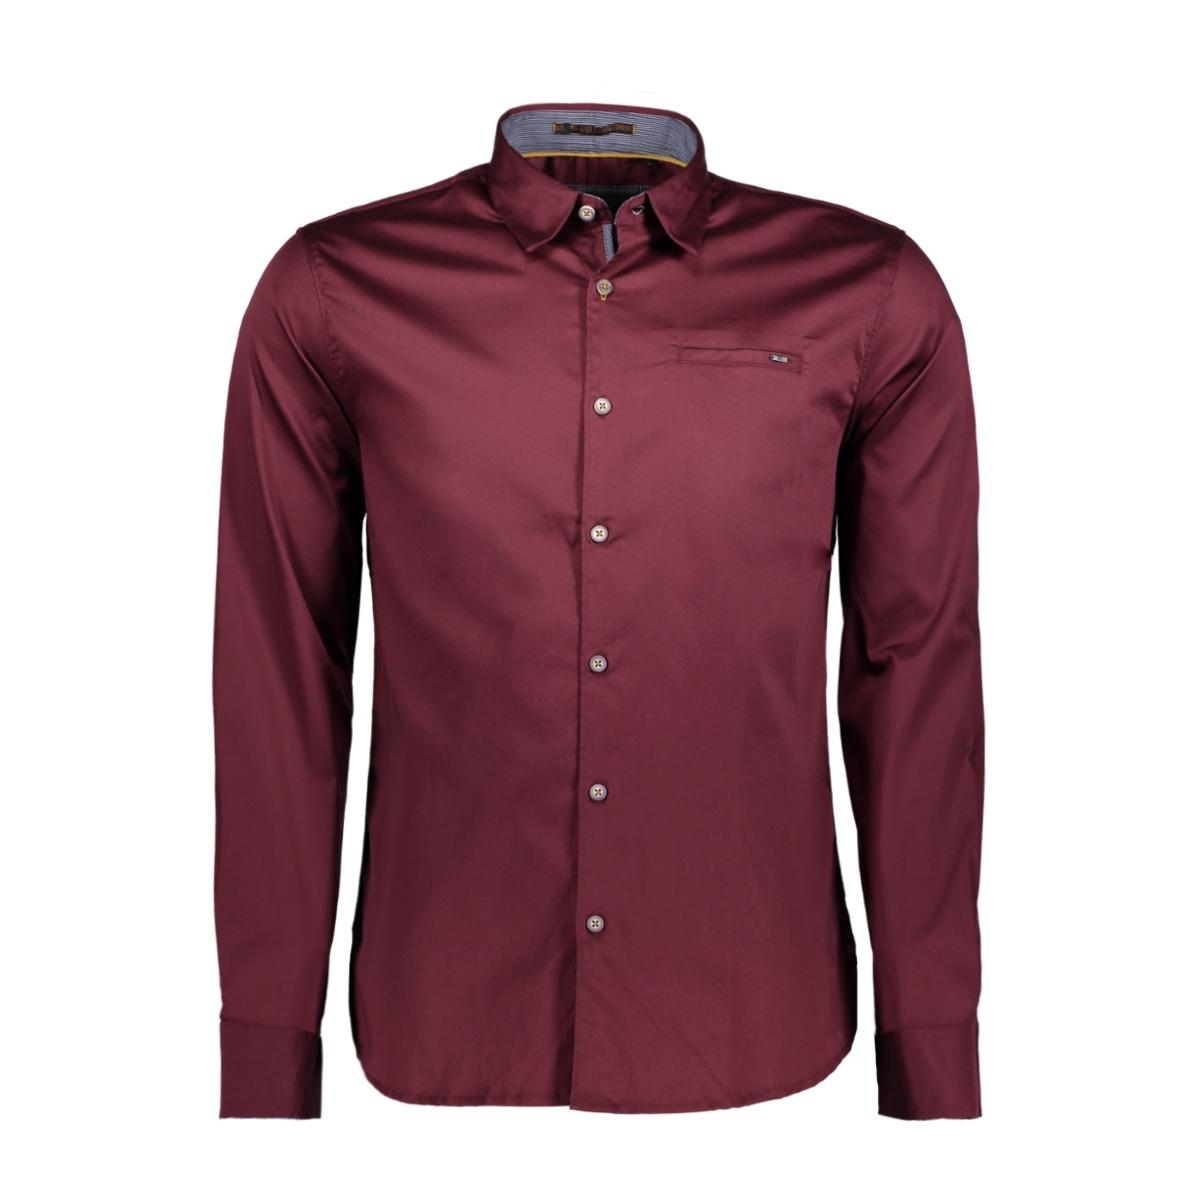 82430803 no-excess overhemd 083 aubergine